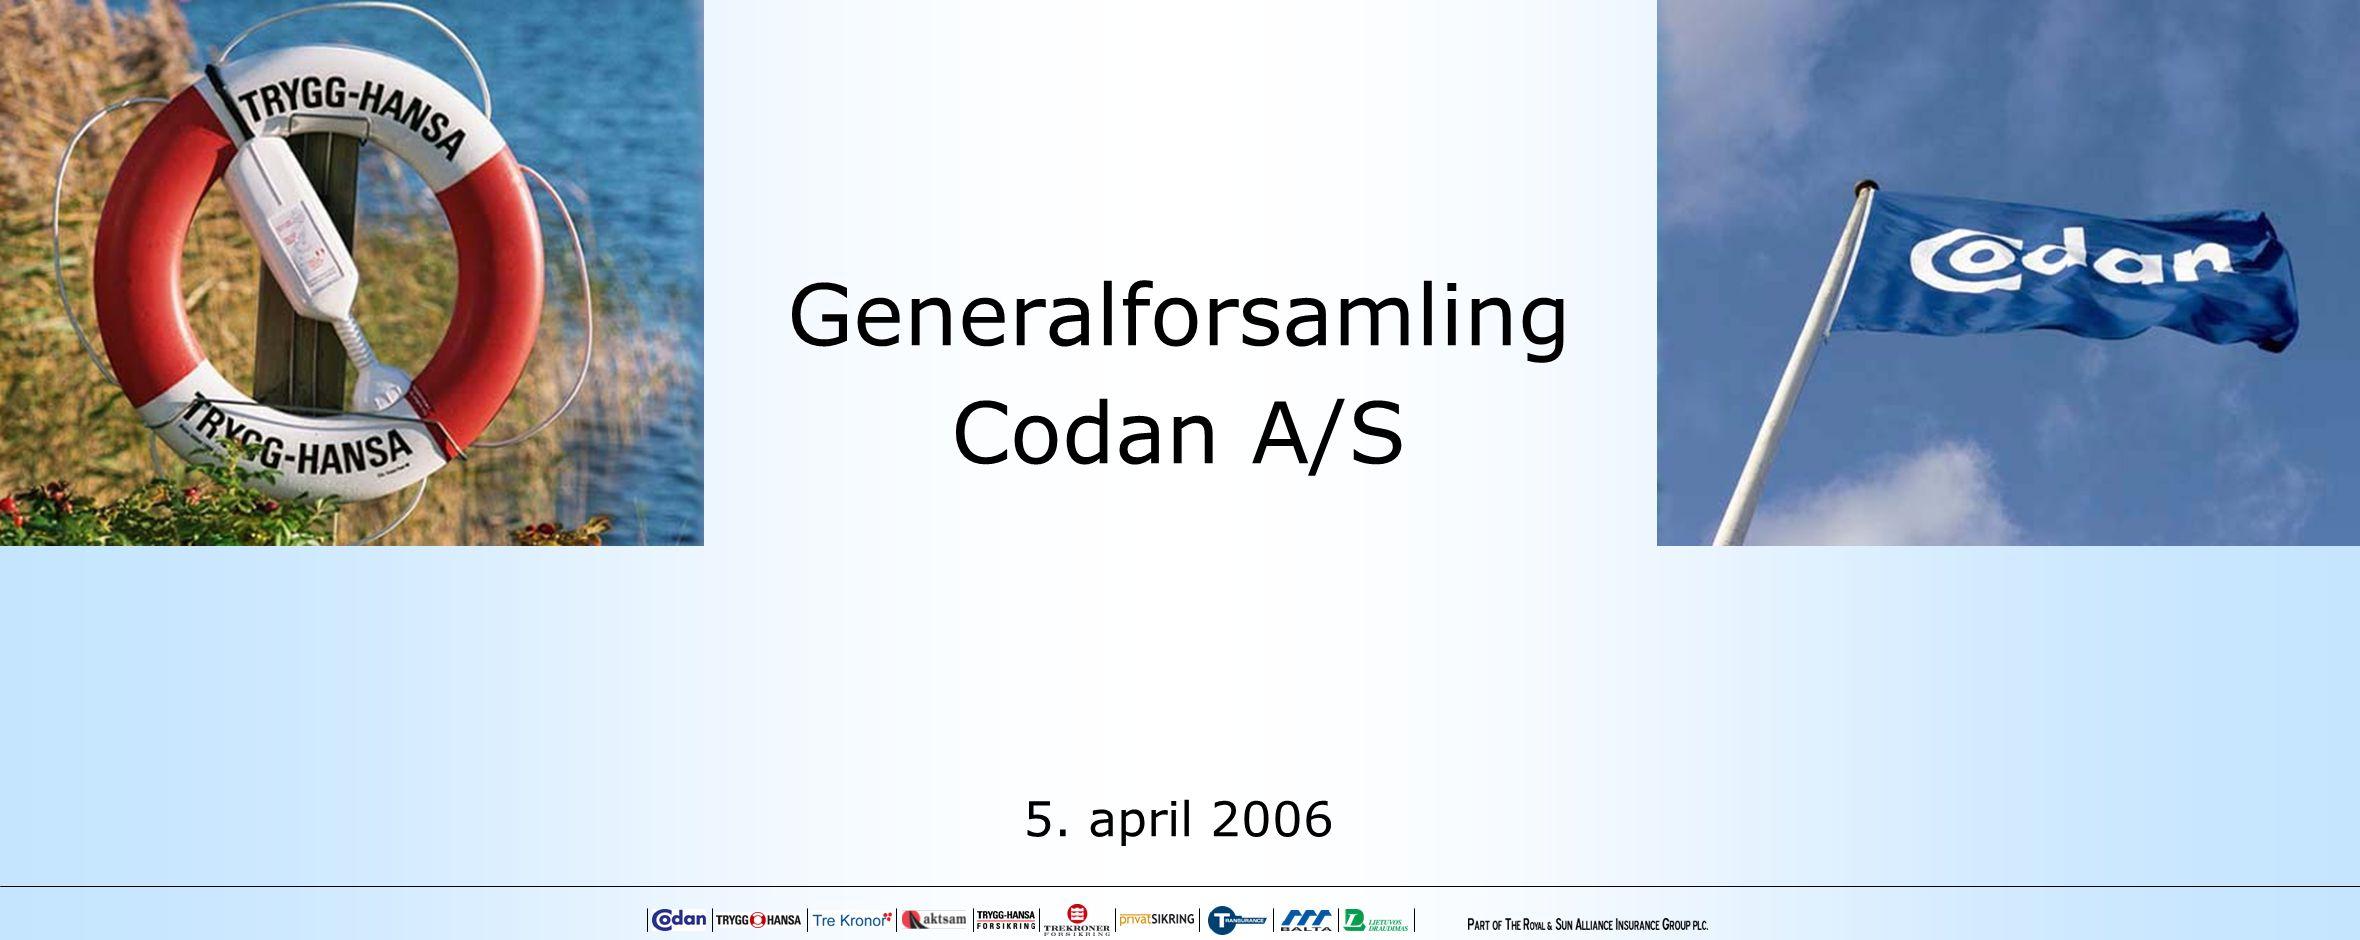 Generalforsamling Codan A/S 5. april 2006